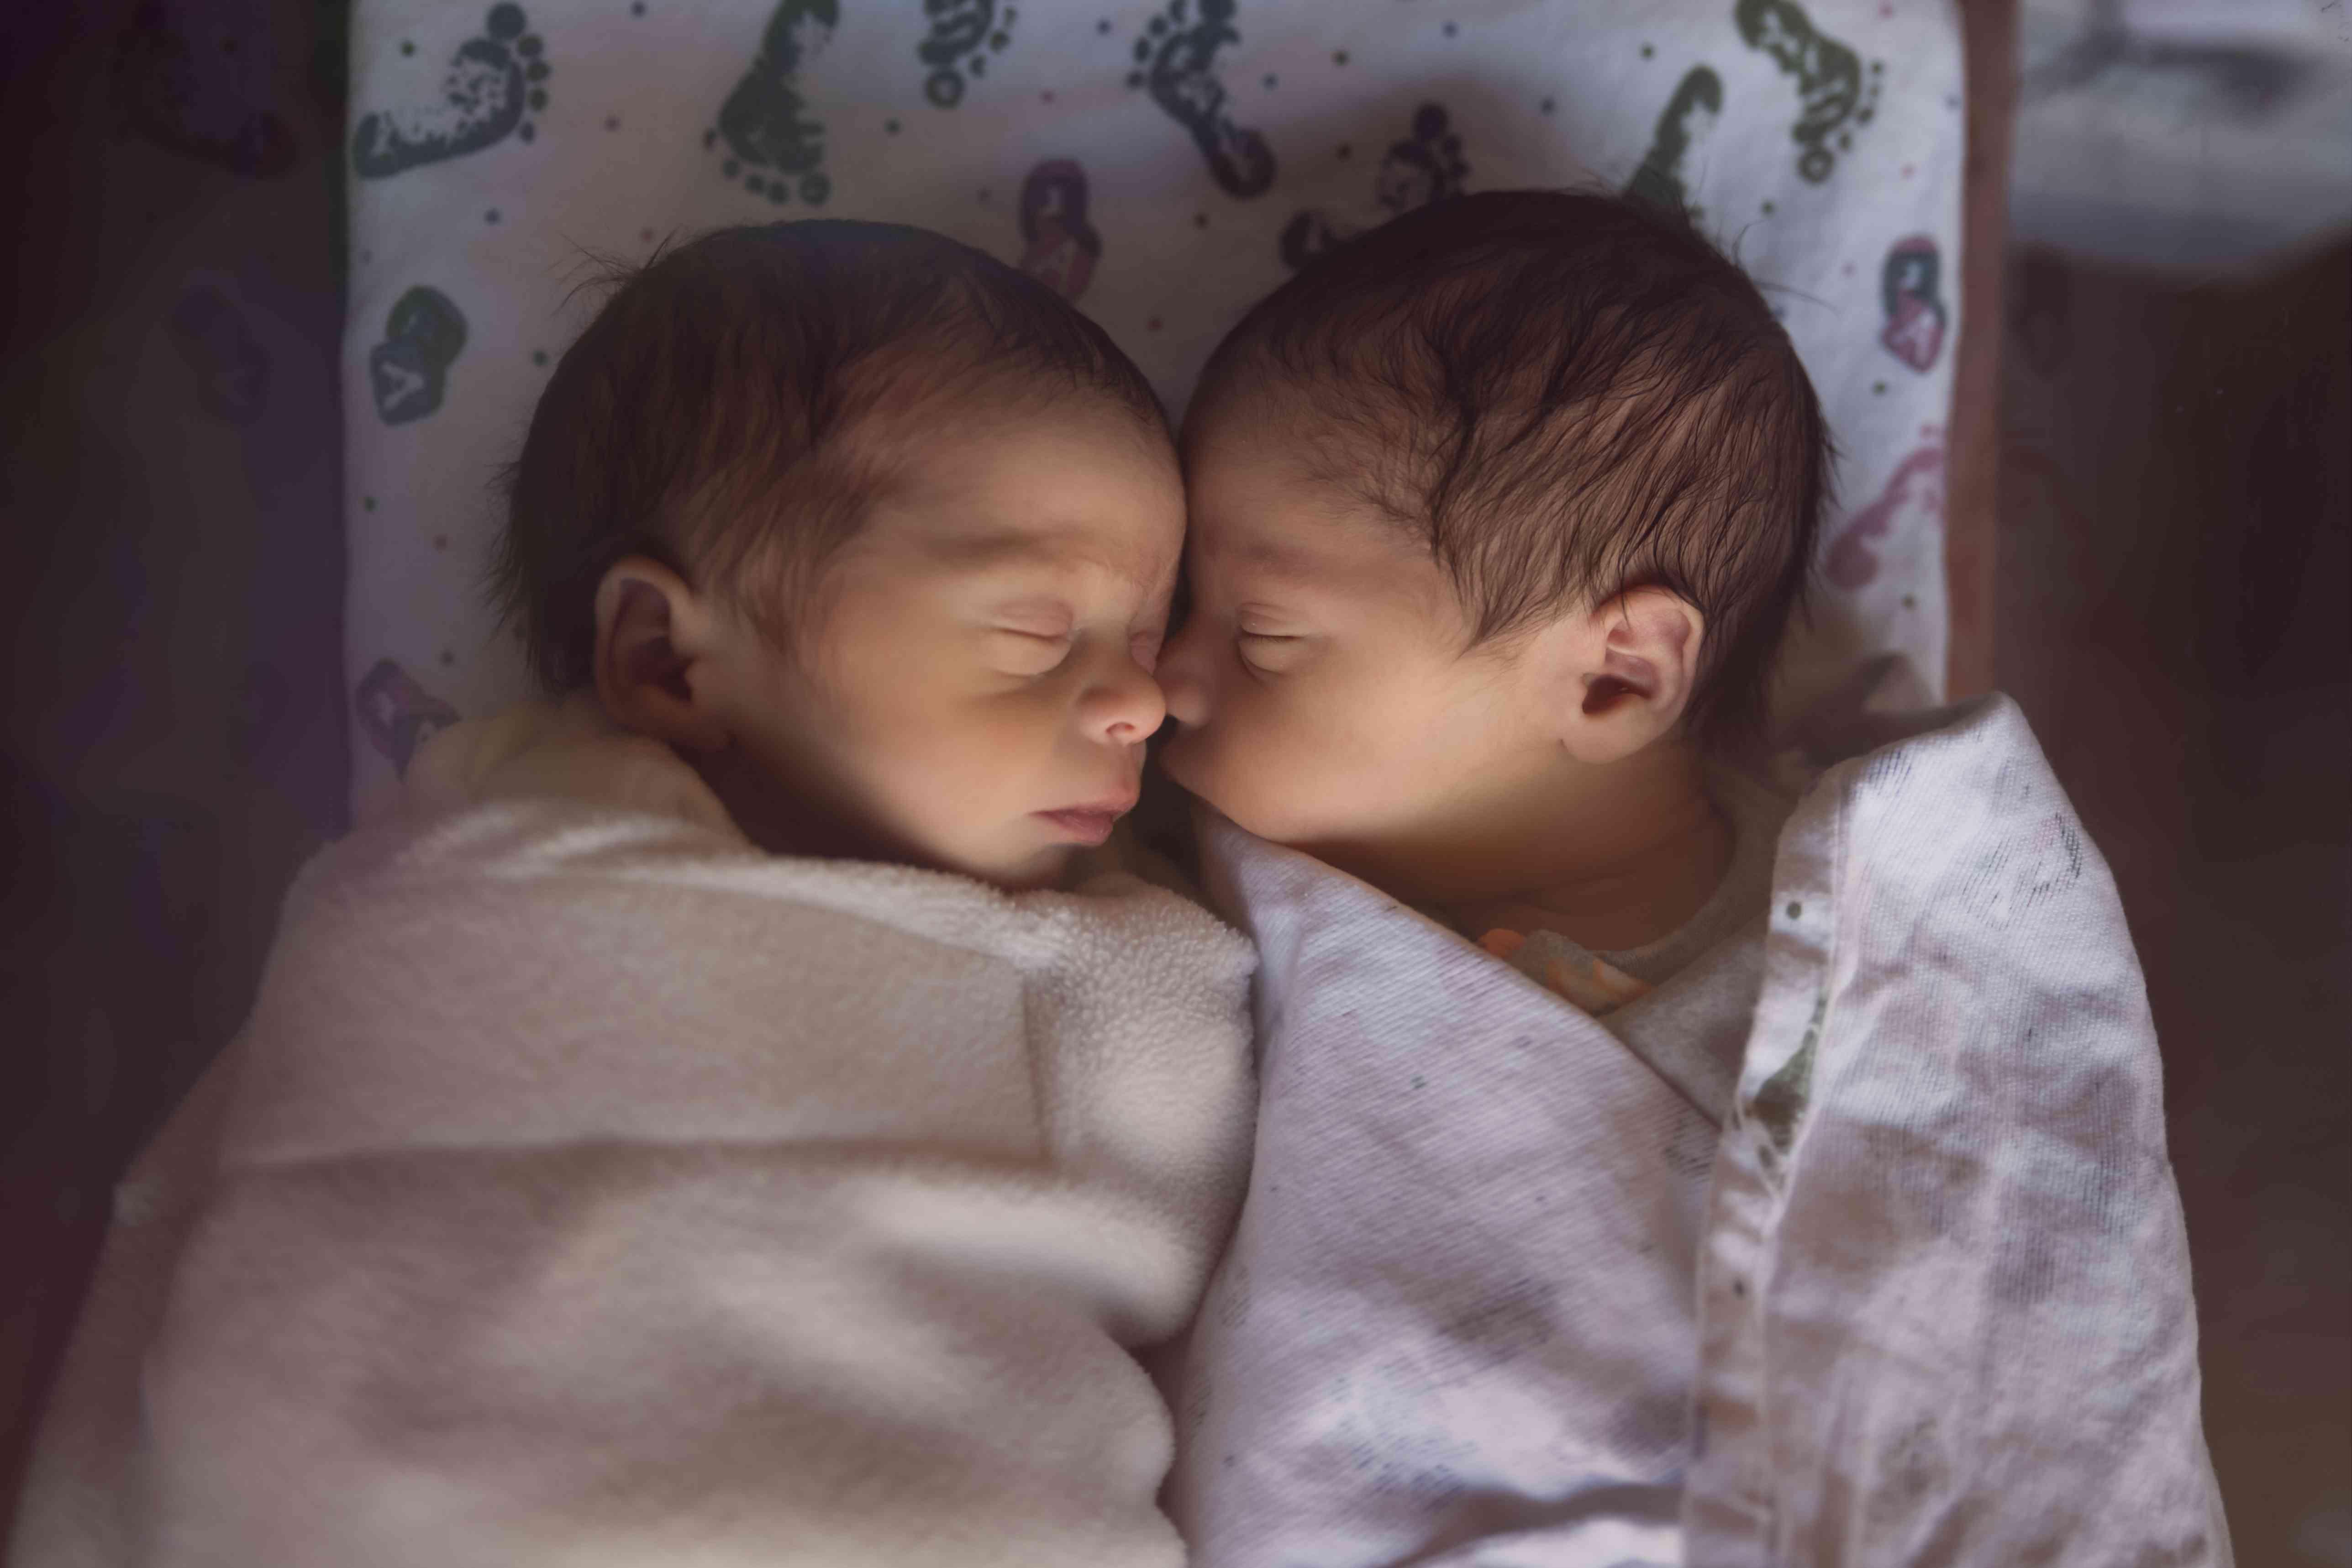 newborn fraternal twins in hospital sleep together